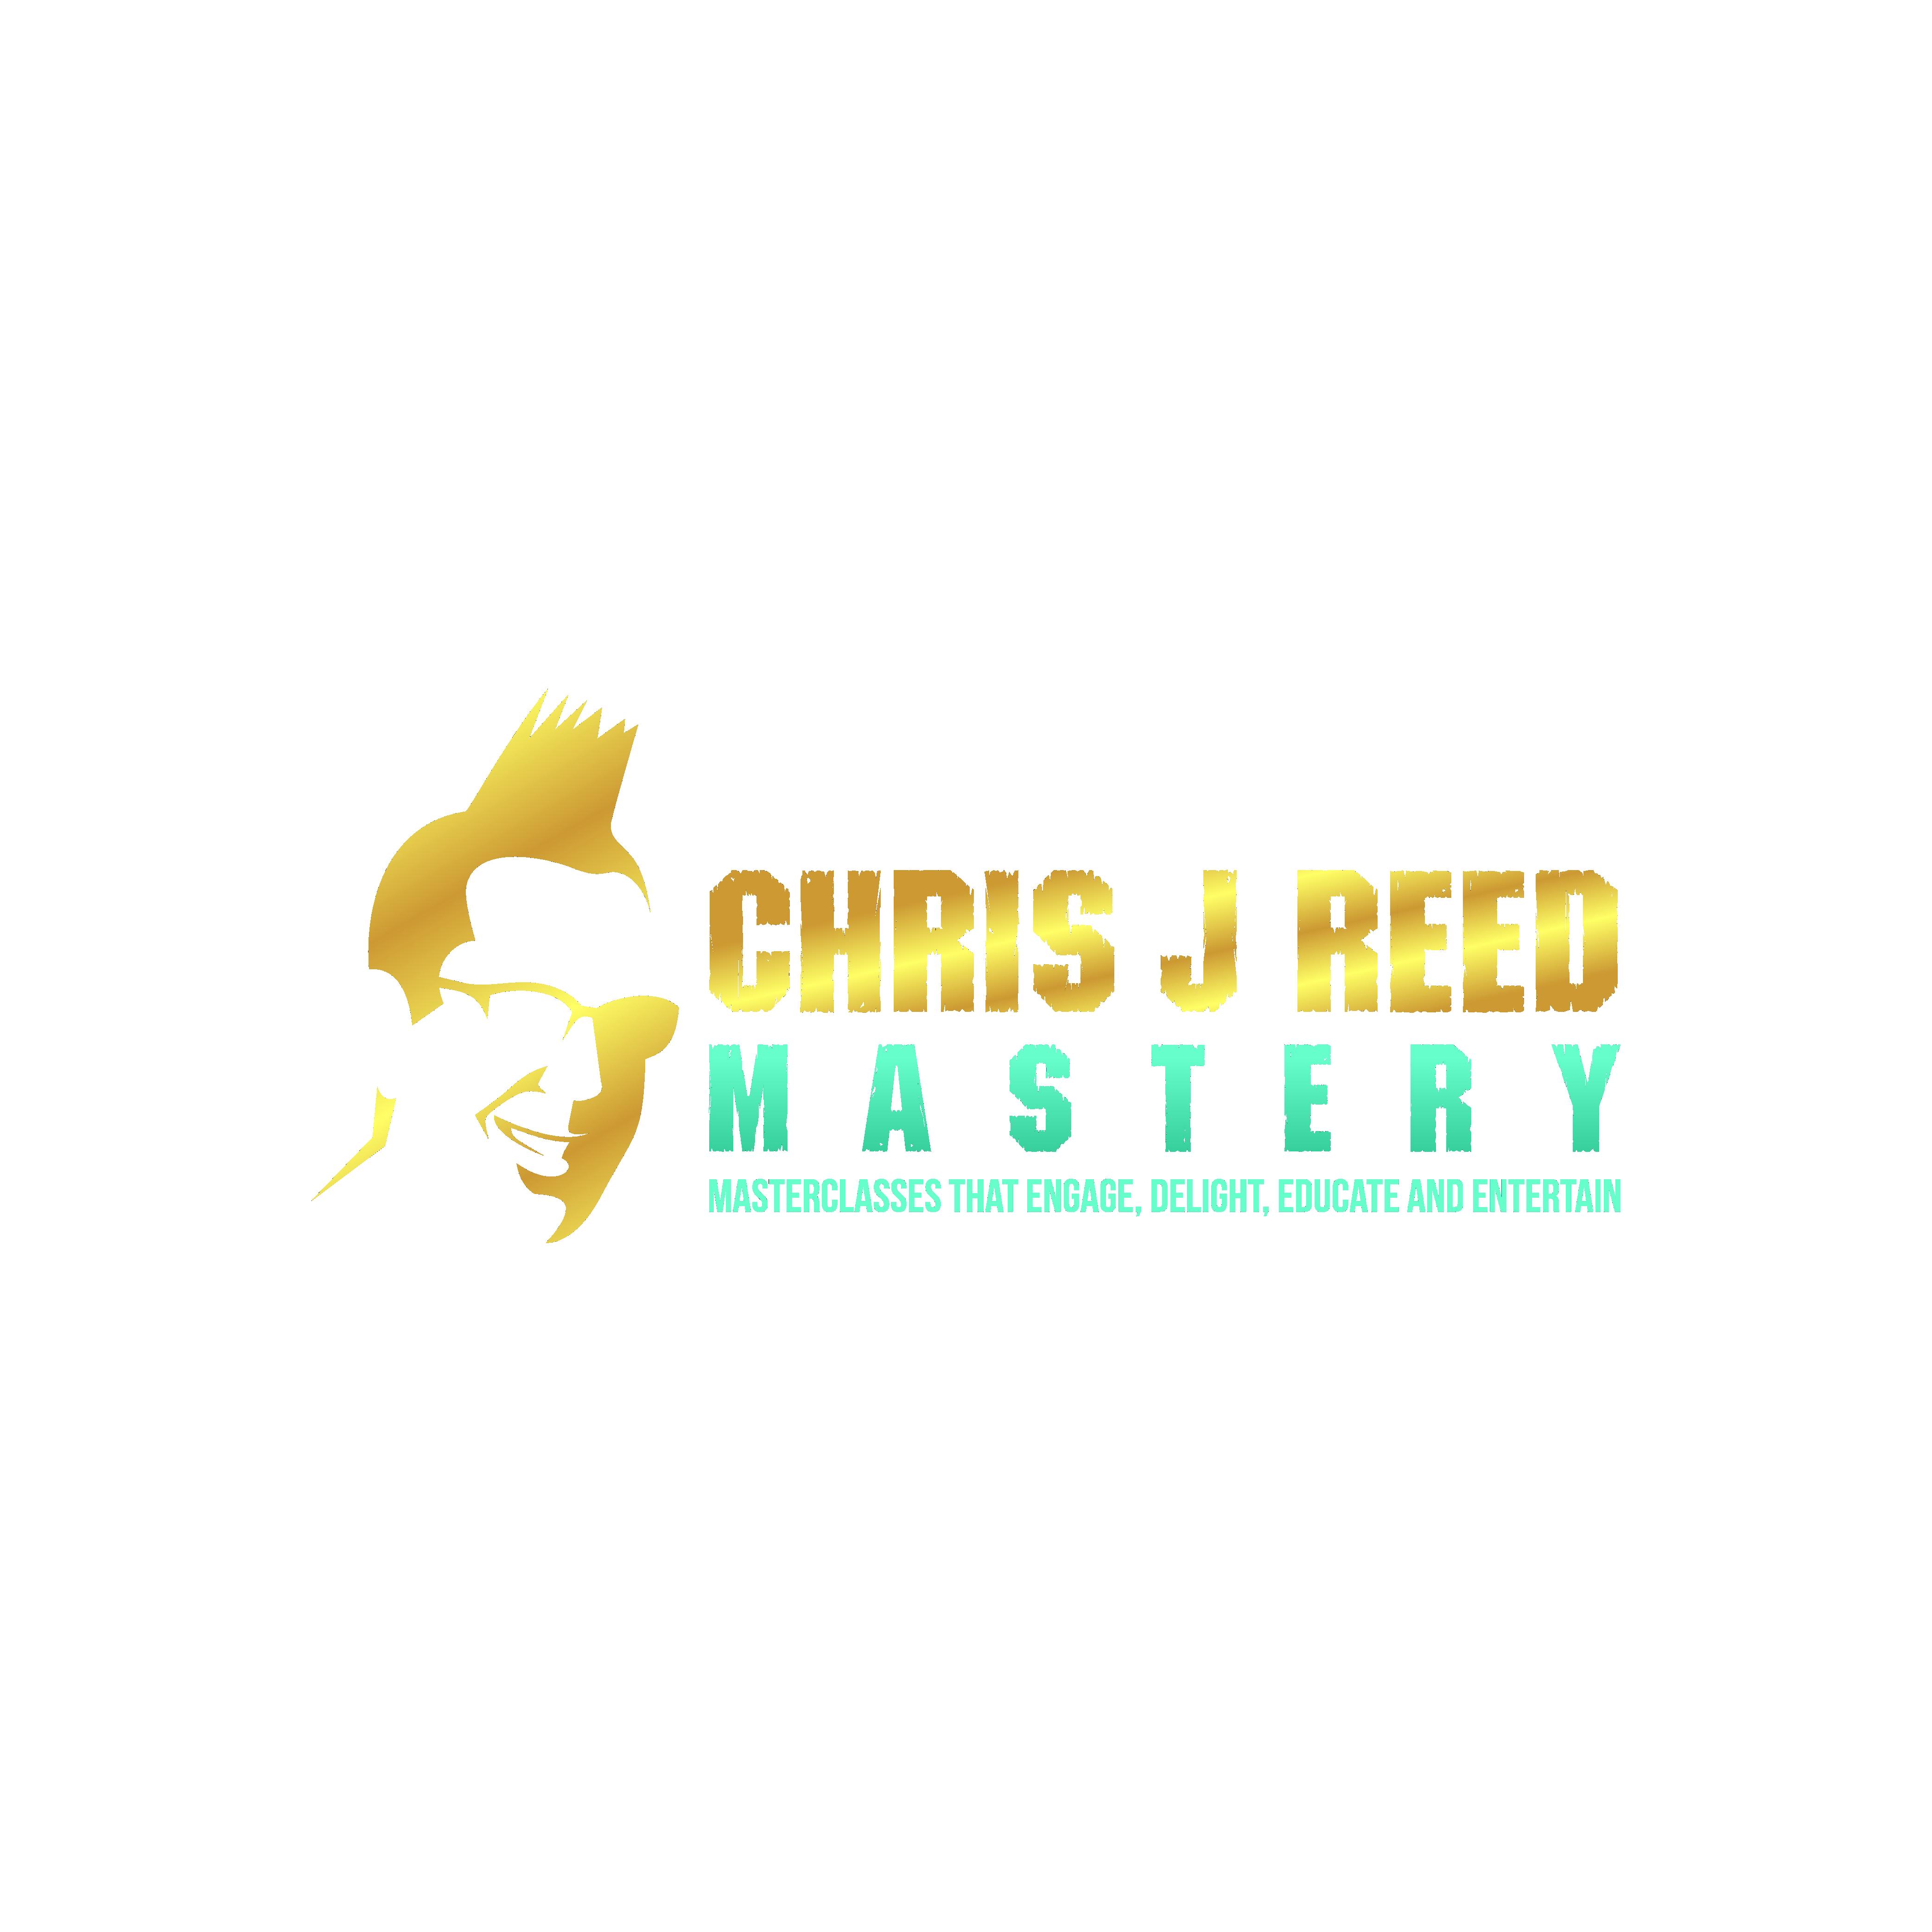 Chris J Reed Masterclasses